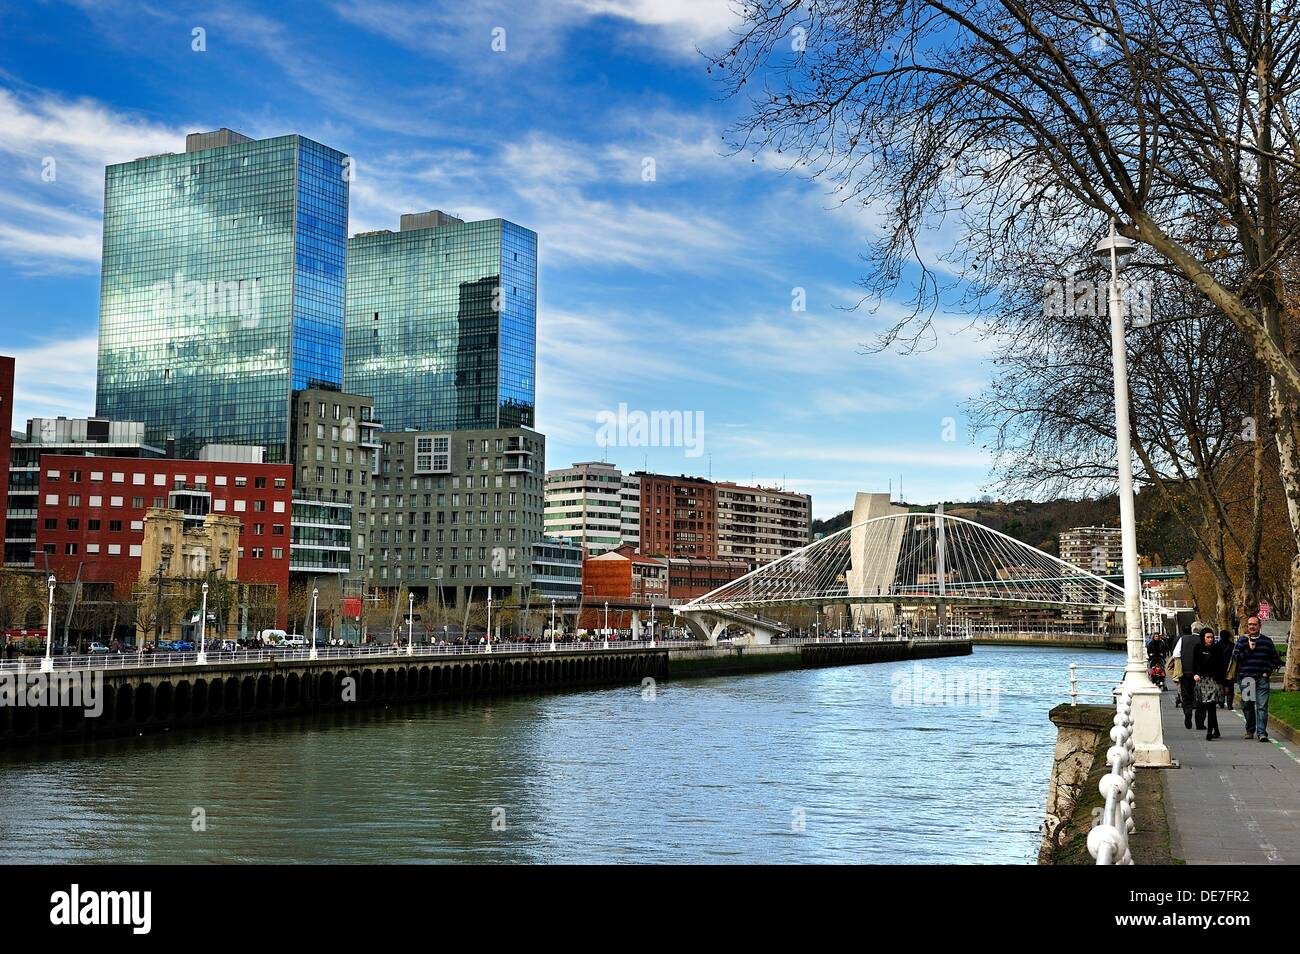 More modern image of Bilbao, River view of the bridge by Santiago Calatrava and Towers Isozaki - Stock Image